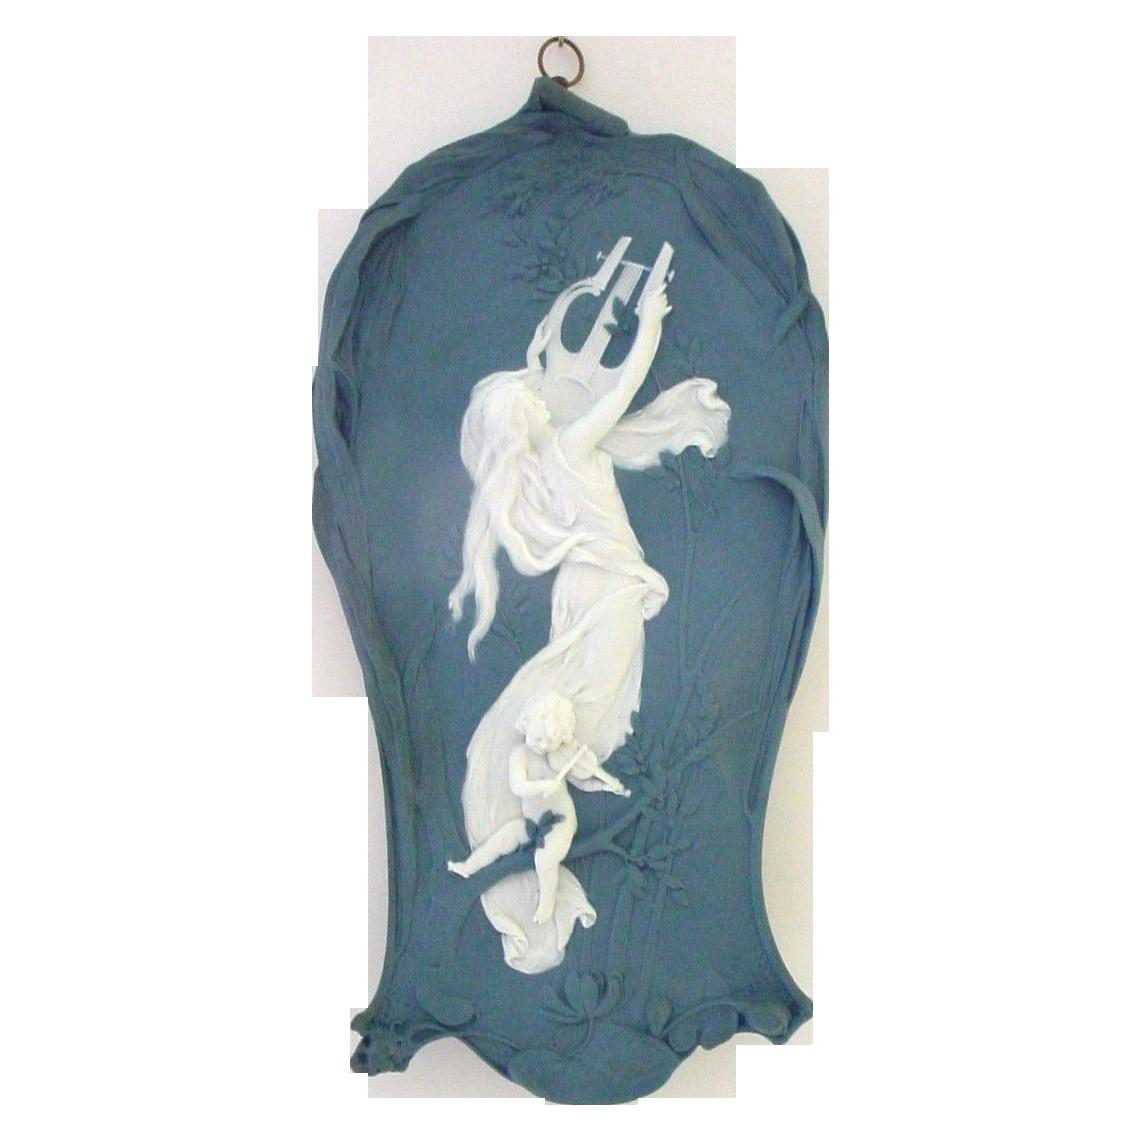 Wonderful Jasperware Jasper Ware Art Nouveau Plaque with Woman, Lyre, Cherub Playing Violin